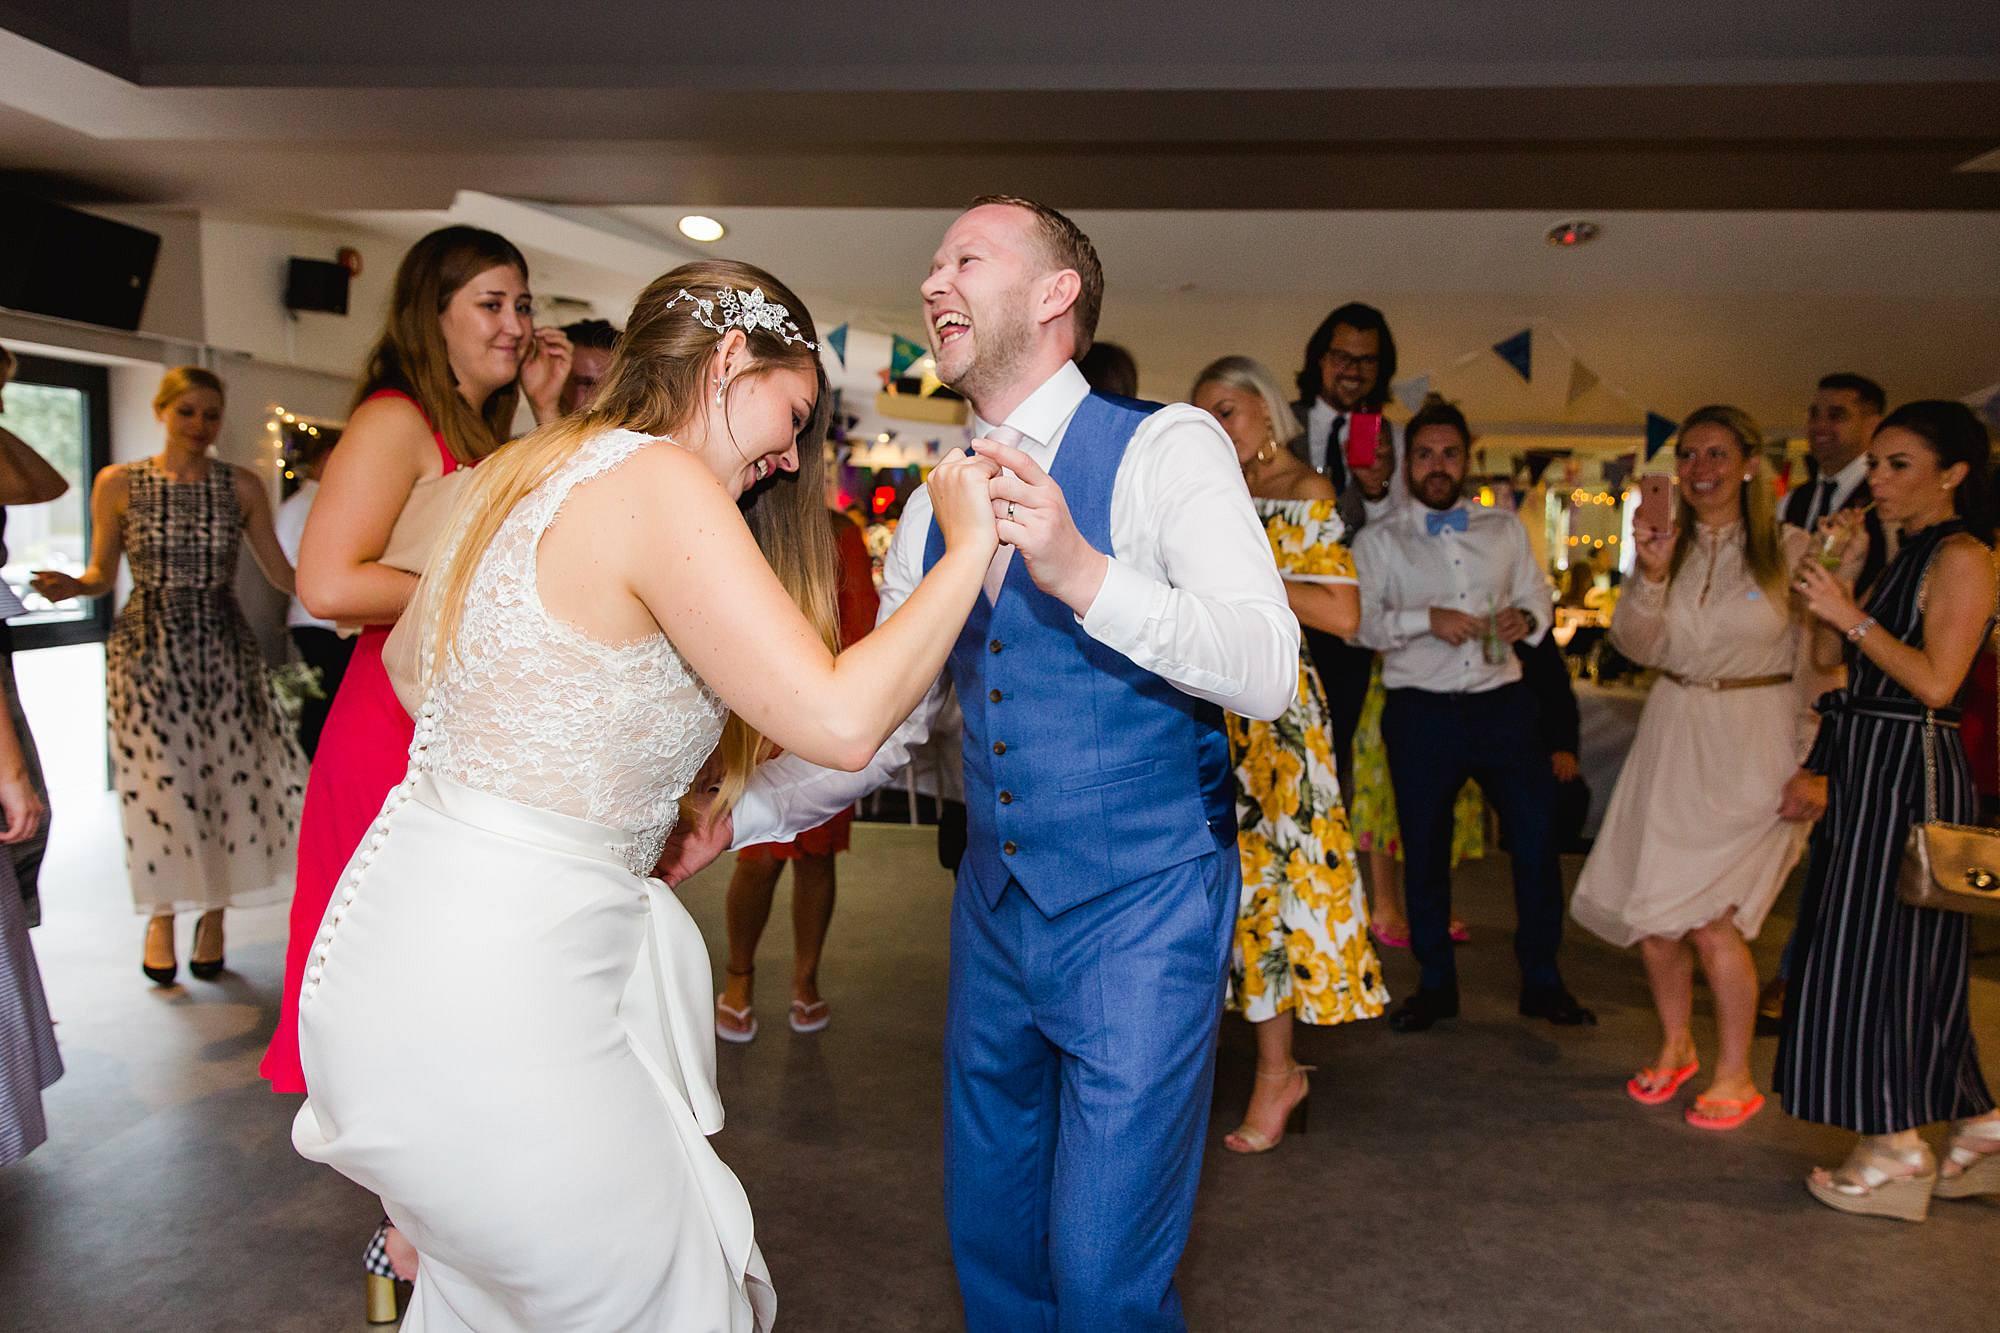 fun portrait of bride and groom dancing